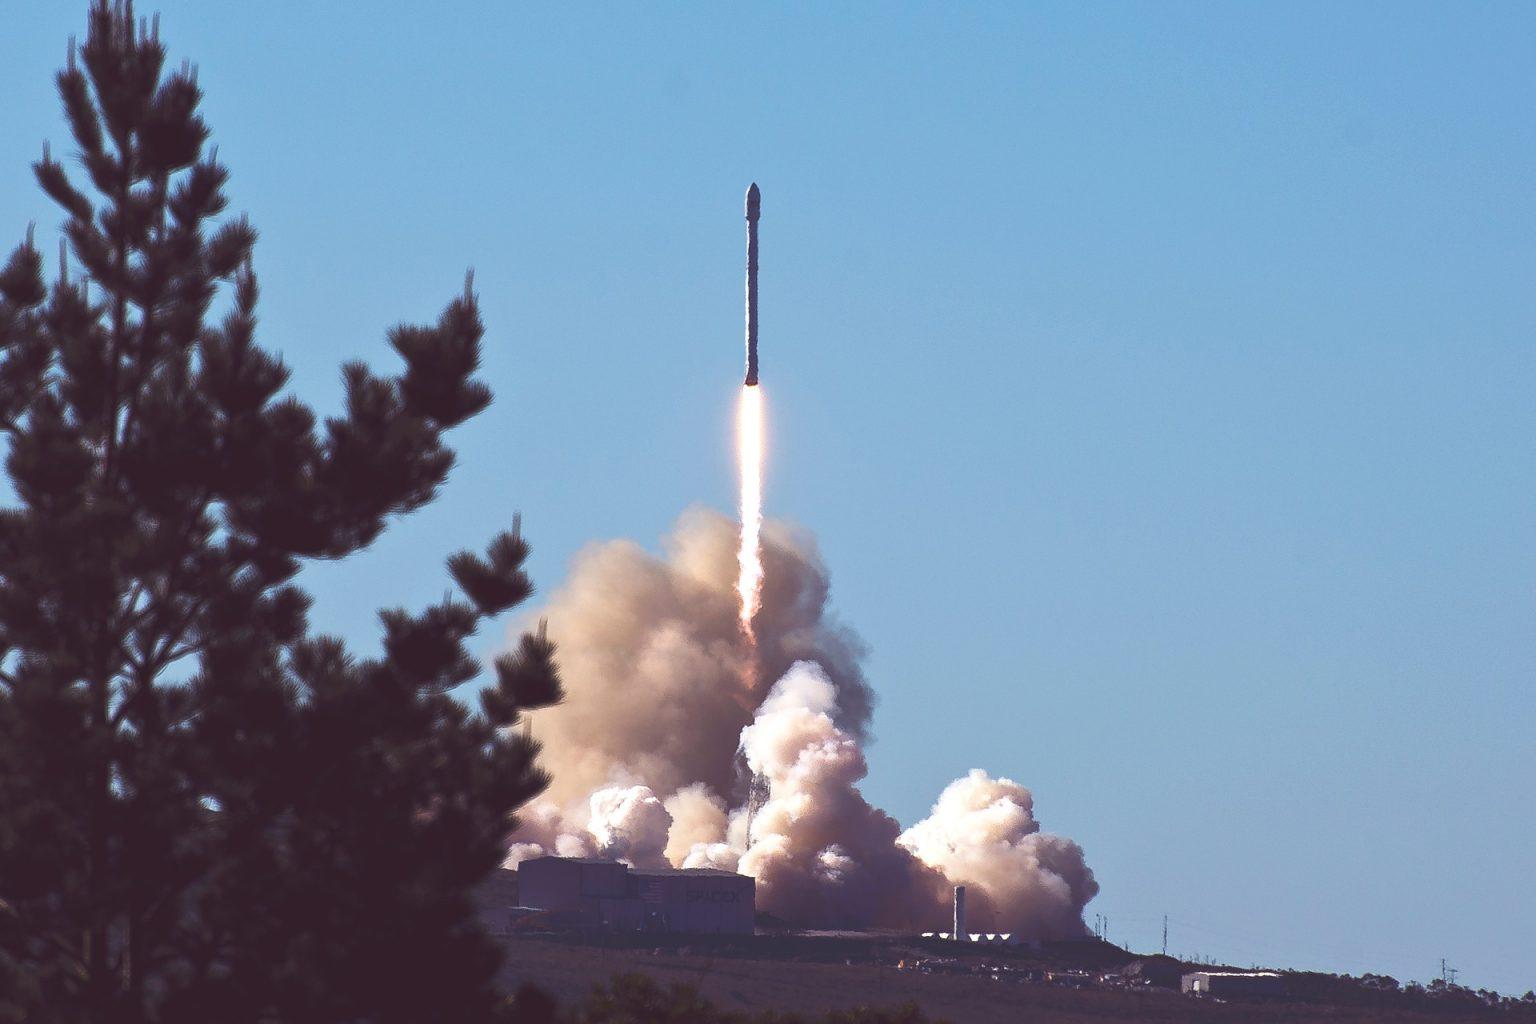 Russian Inter Continental Ballistic Missile (ICBM) Change Analysis (1990-2016)